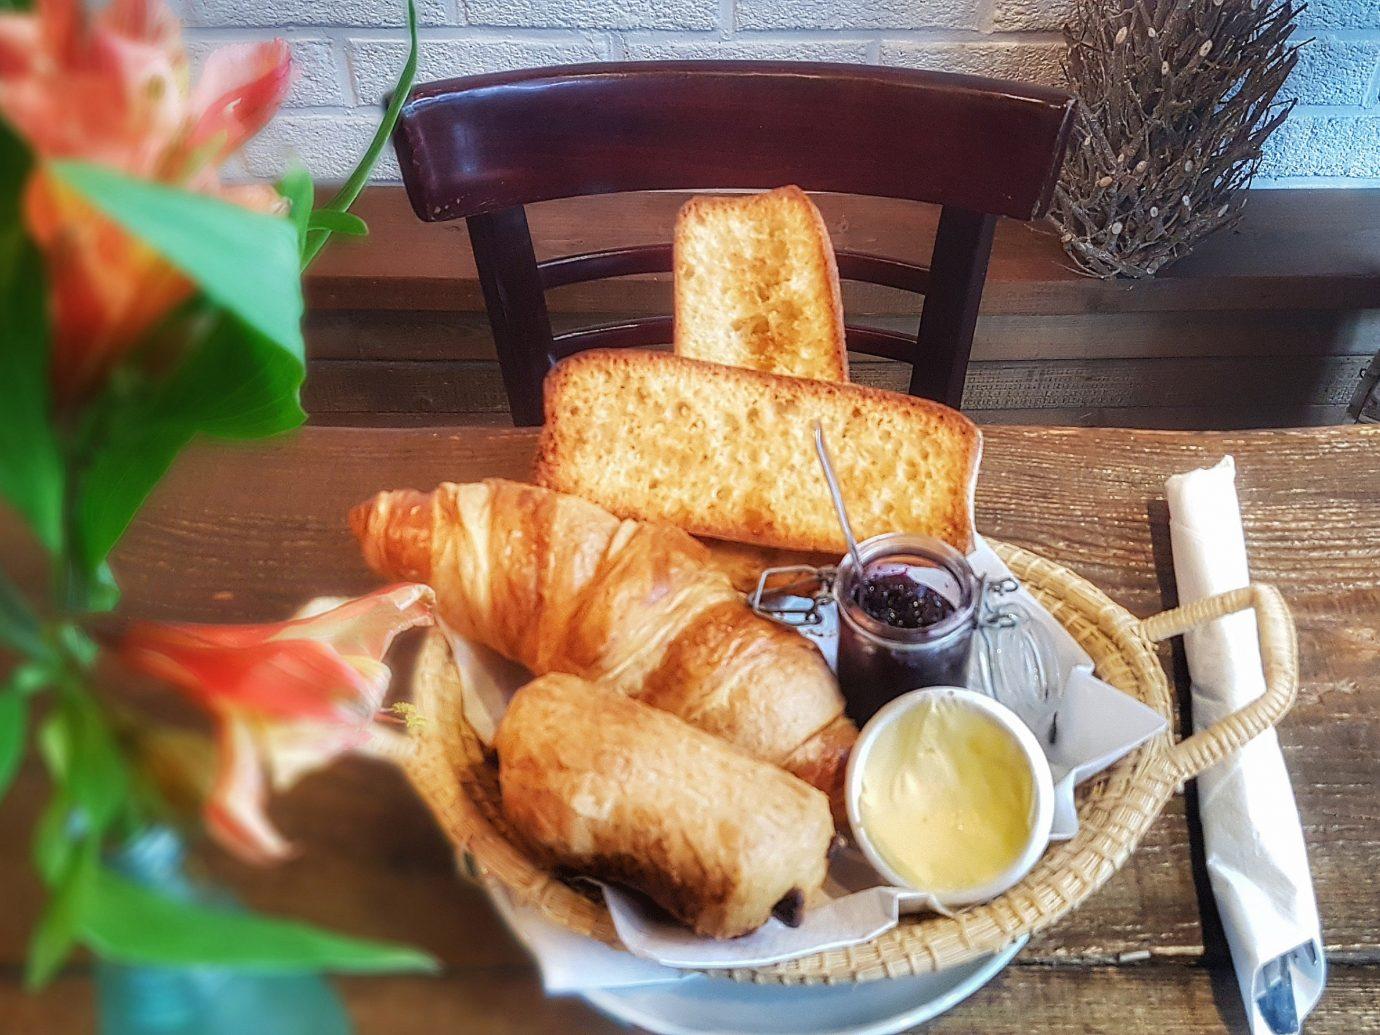 Food + Drink table food dish meal breakfast dessert brunch produce cuisine lunch bread junk food